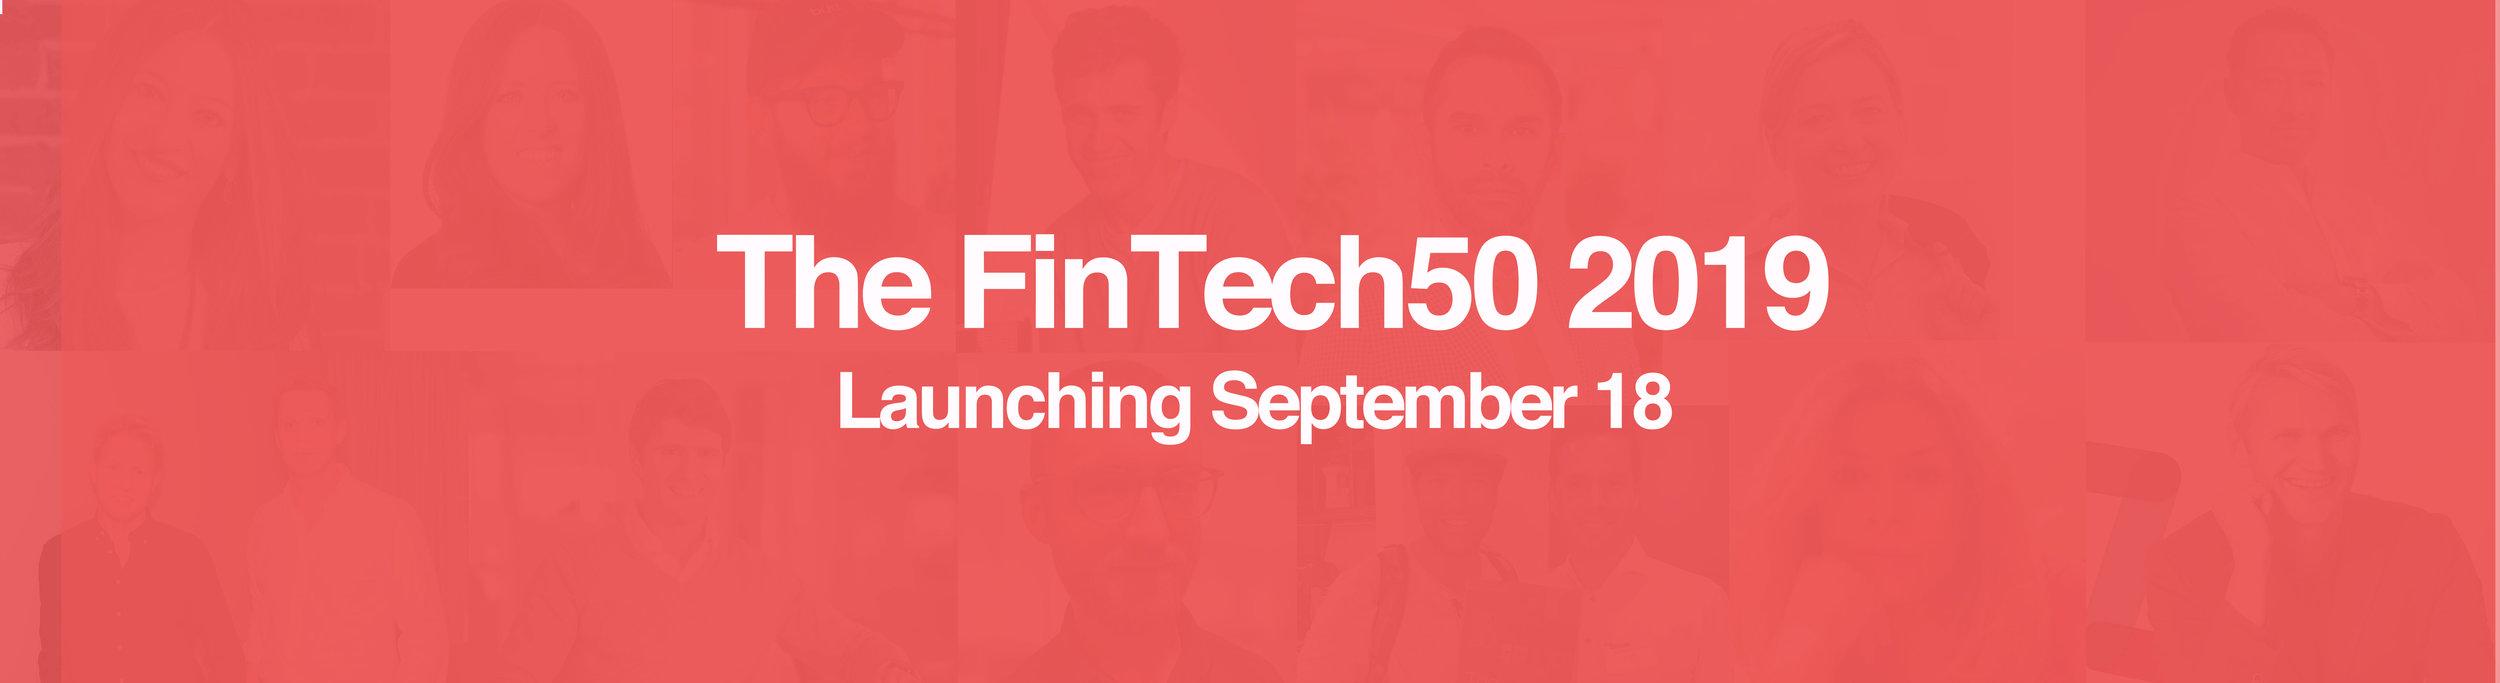 The FinTech 50 | The FinTech50 | The 50 Hottest FinTechs in